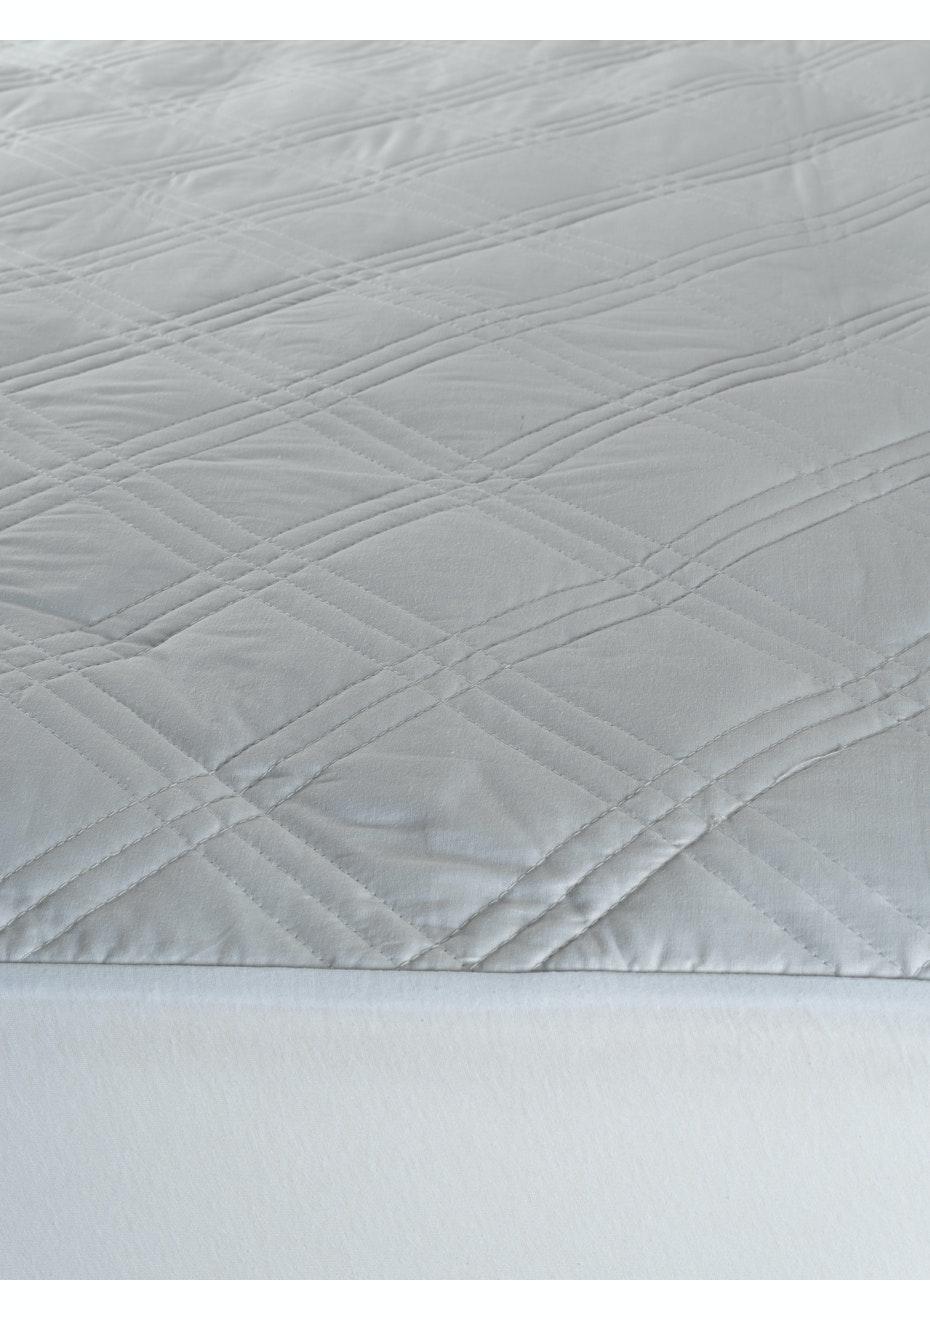 Diamond All Cotton Mattress Protectors - DB